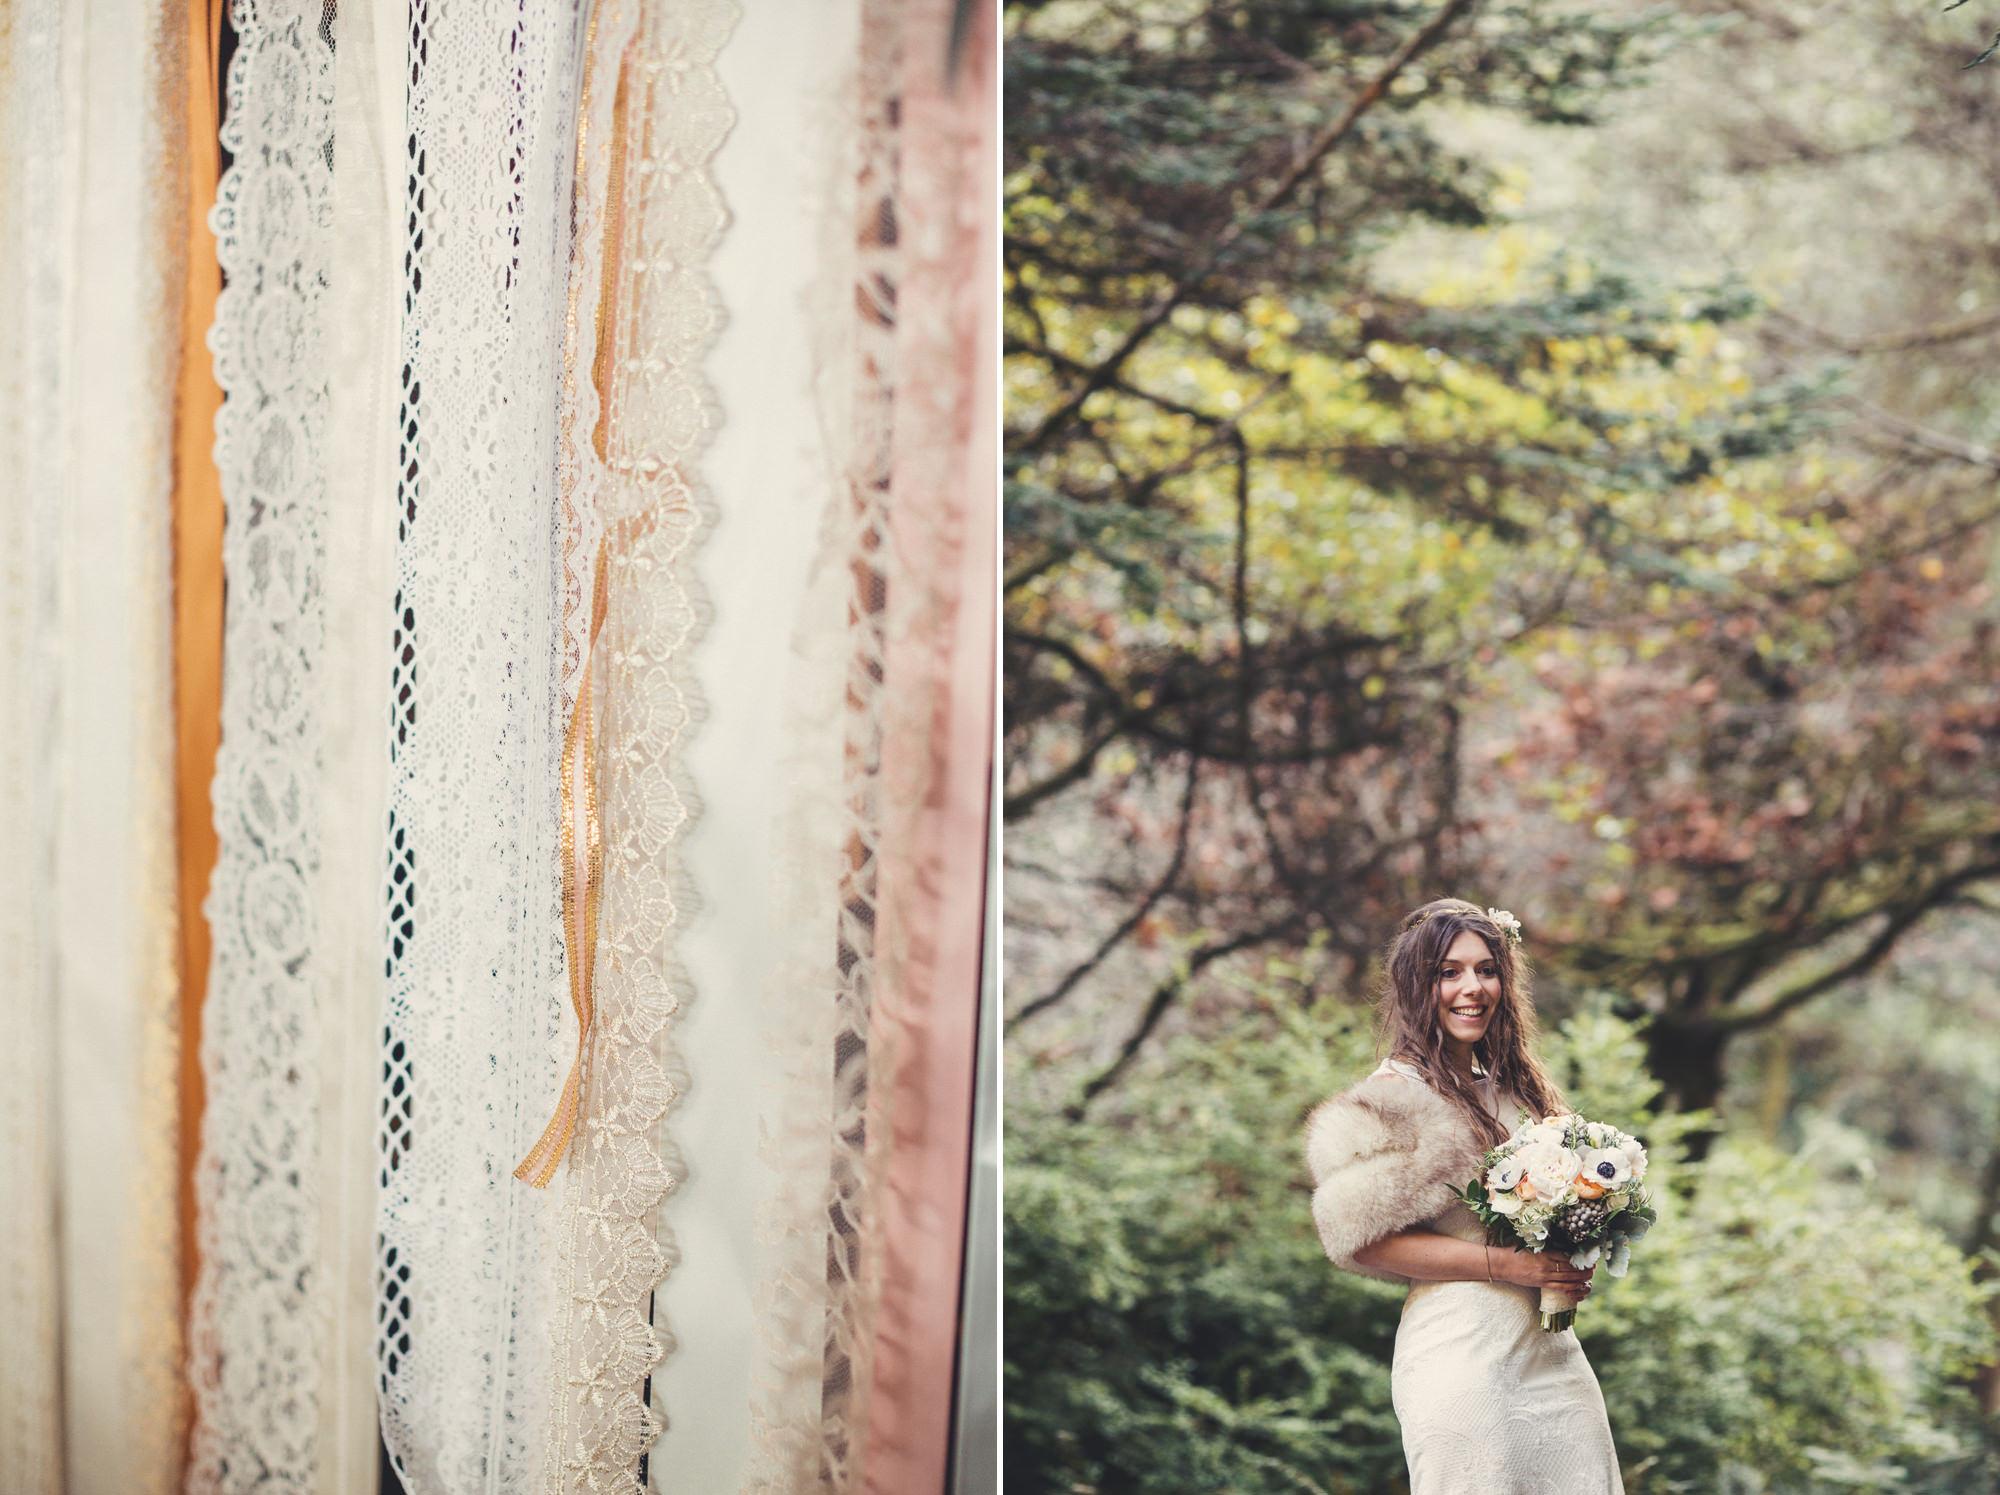 Little River Inn Wedding@Anne-Claire Brun 105